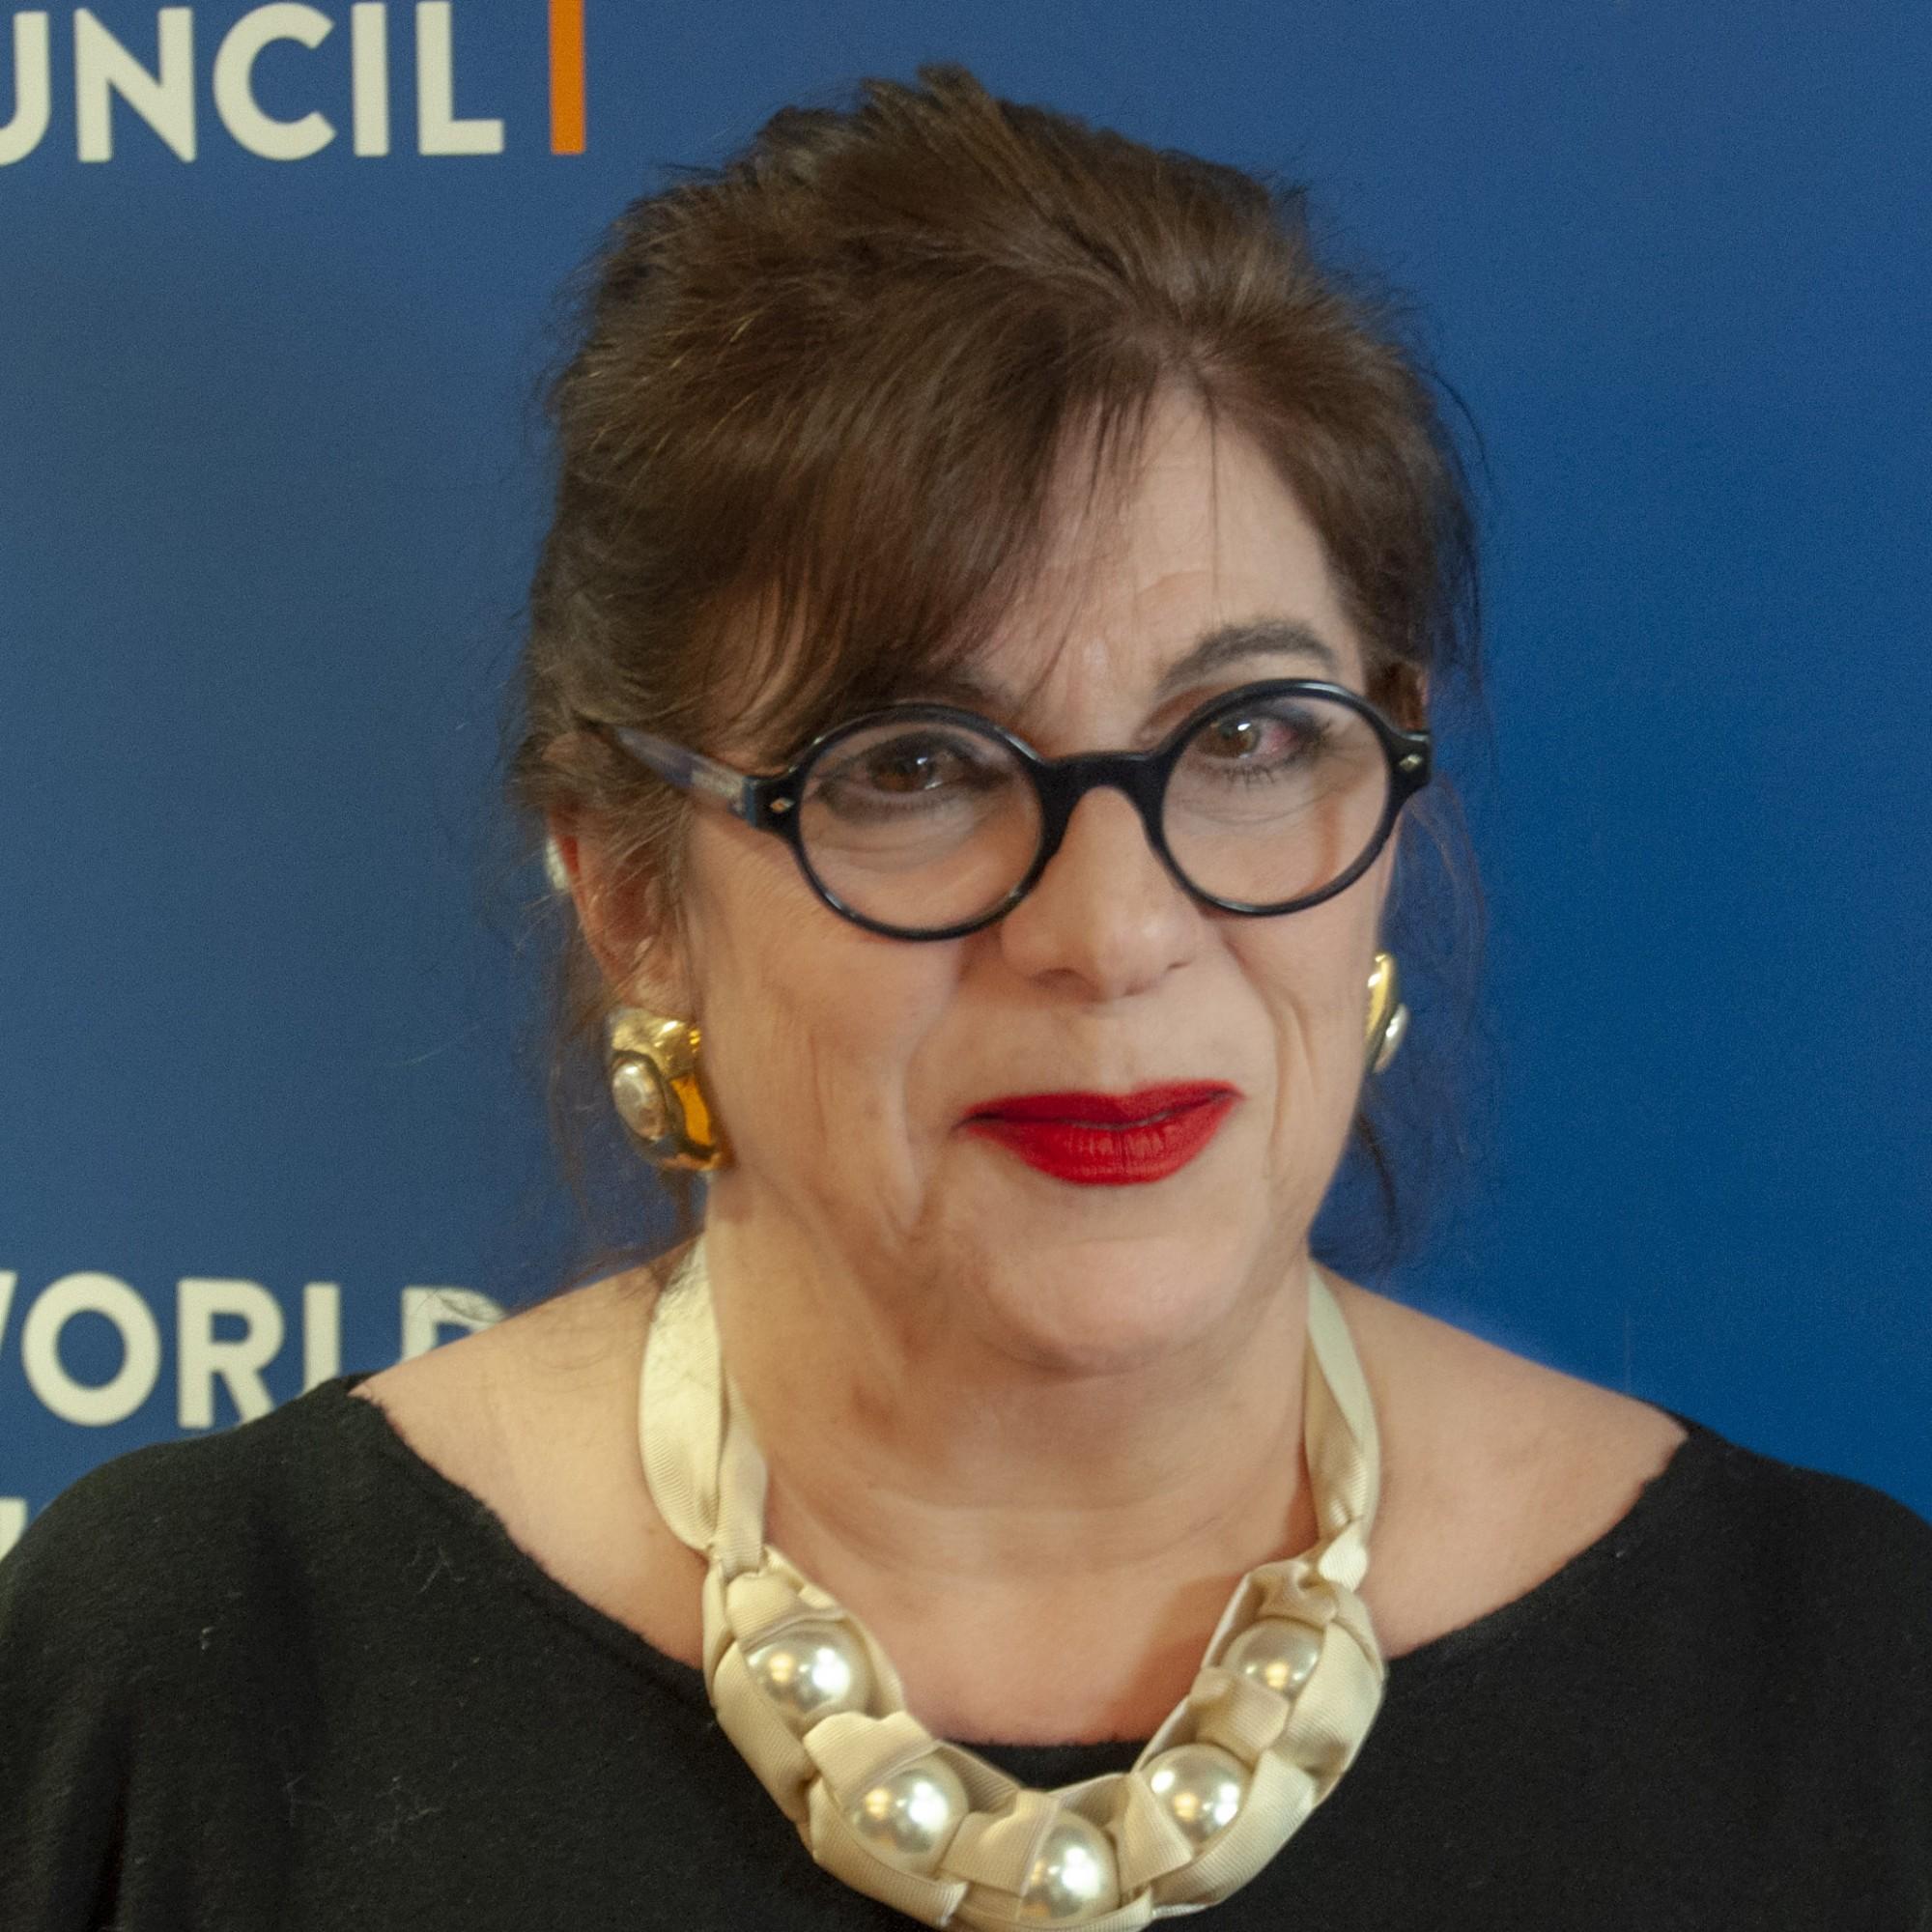 Kate Dourian